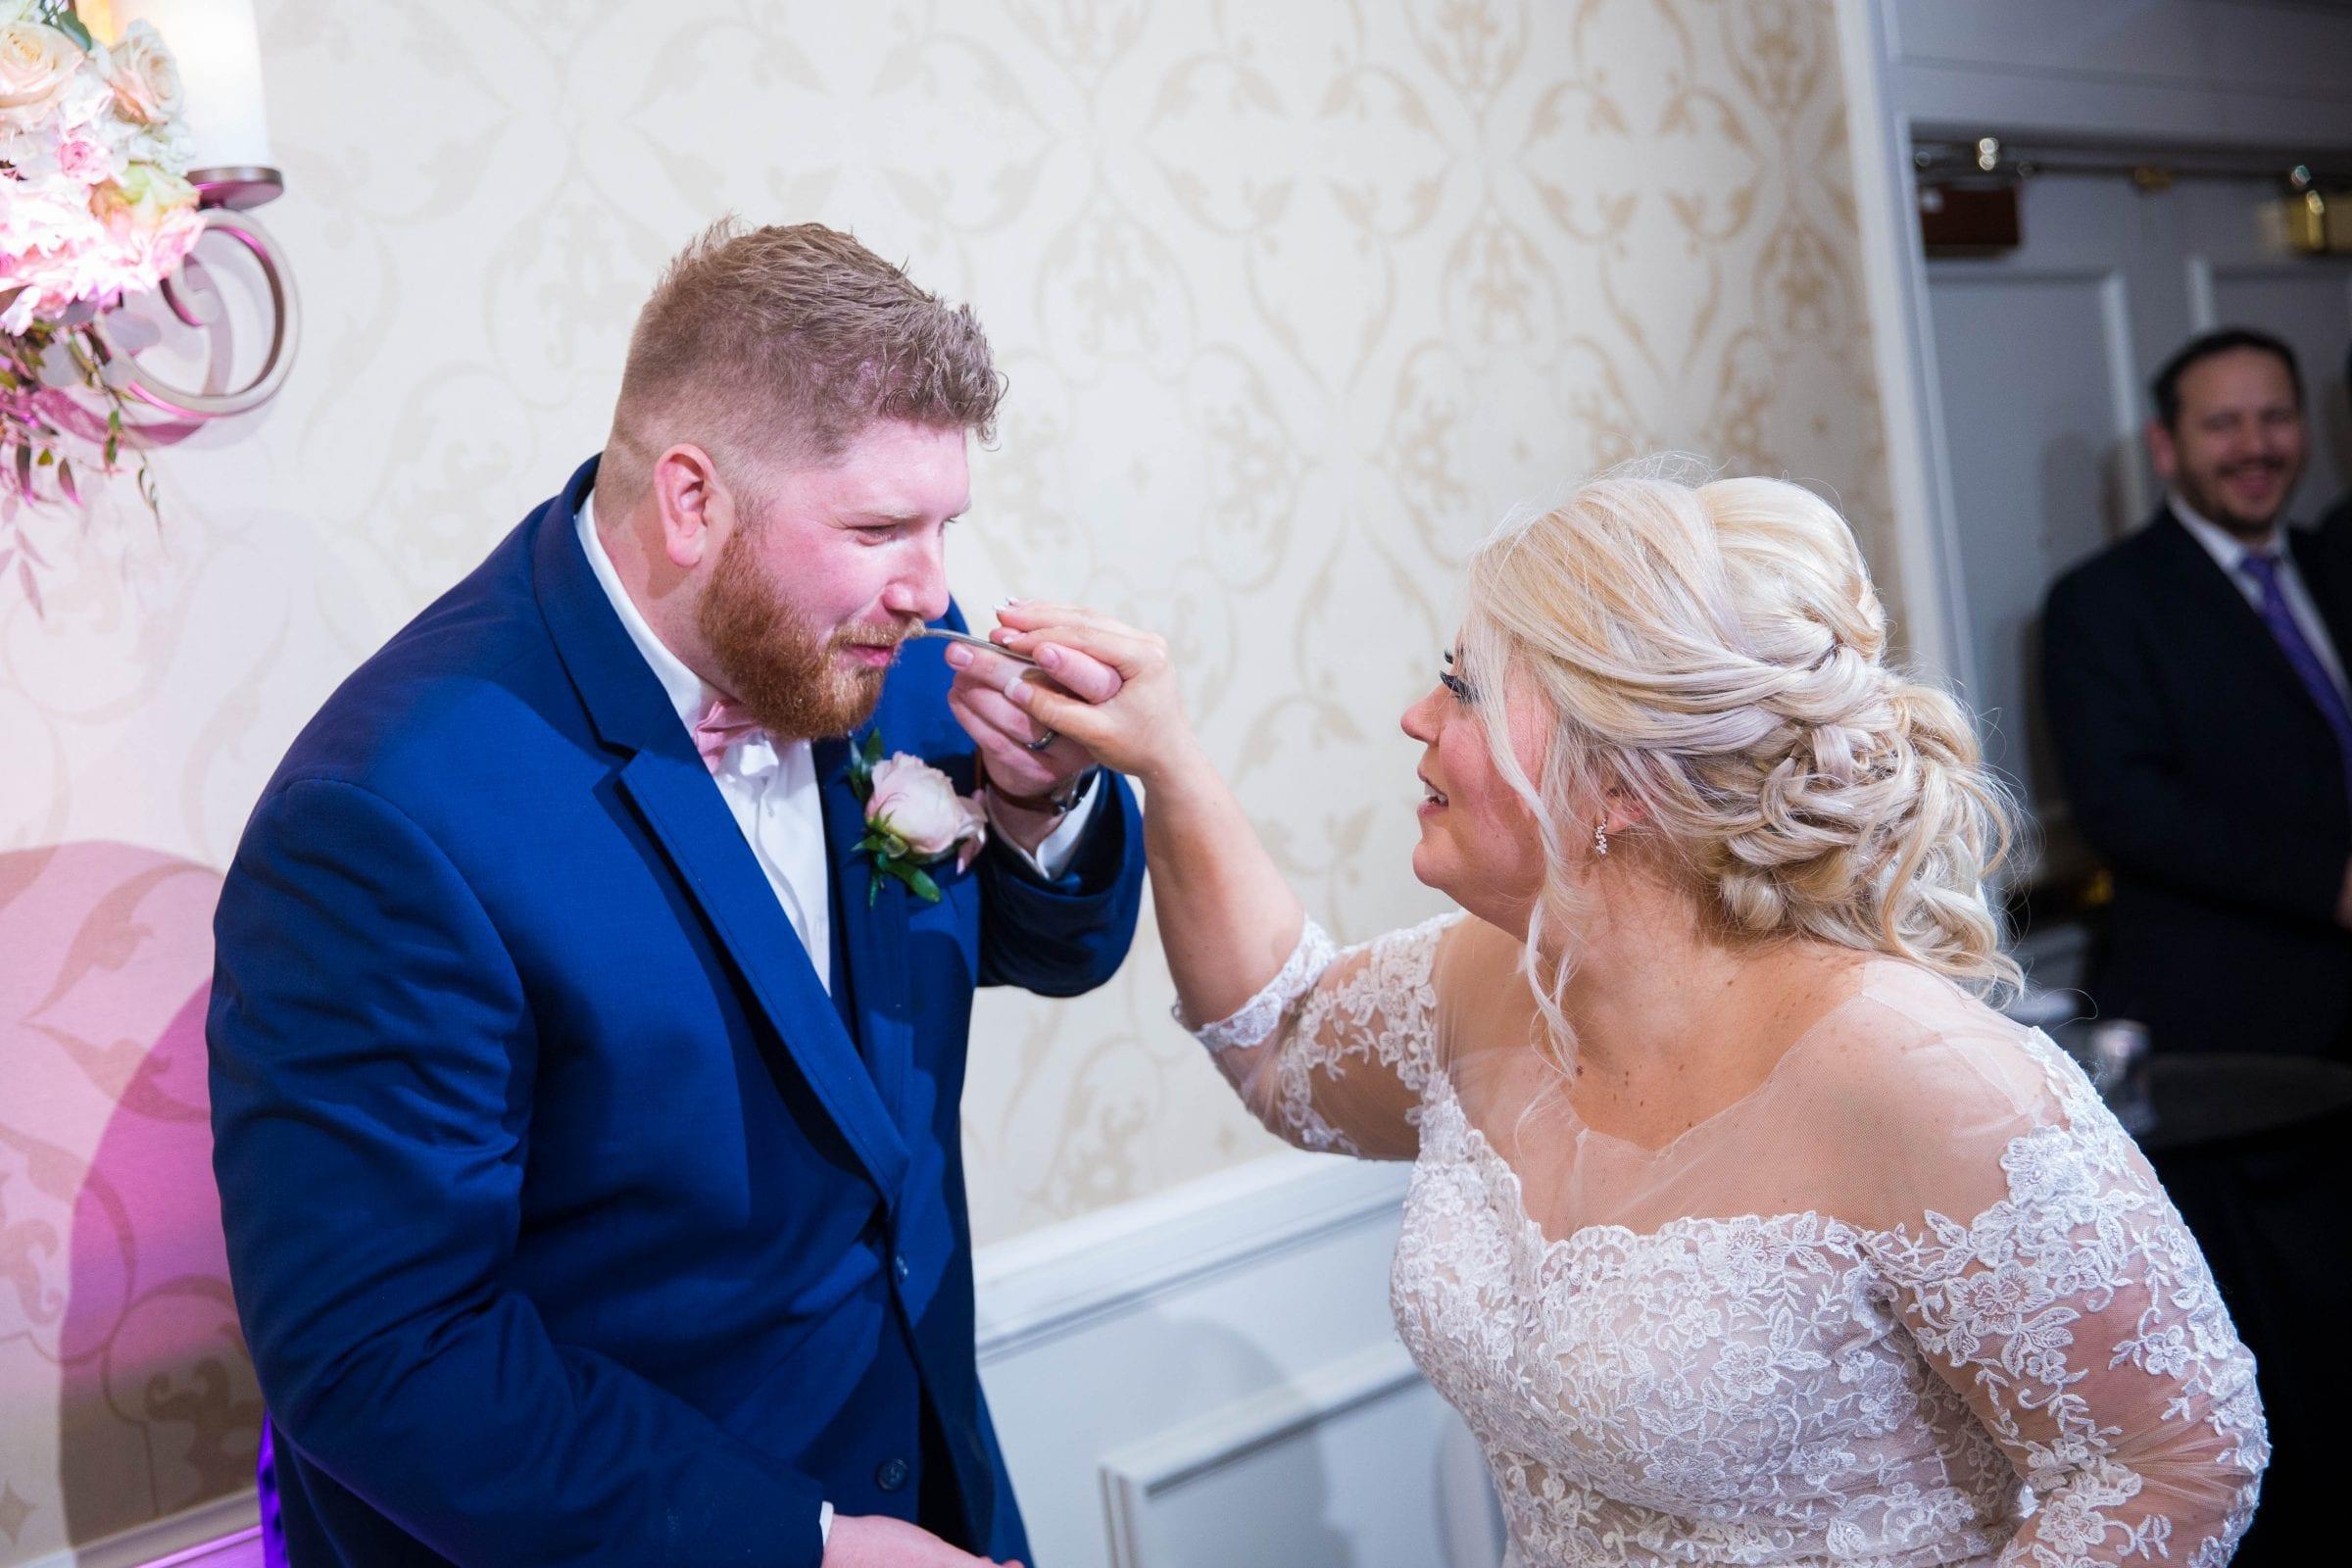 Crawford wedding Omni Del Mansion riverwalk grooms cake feeding